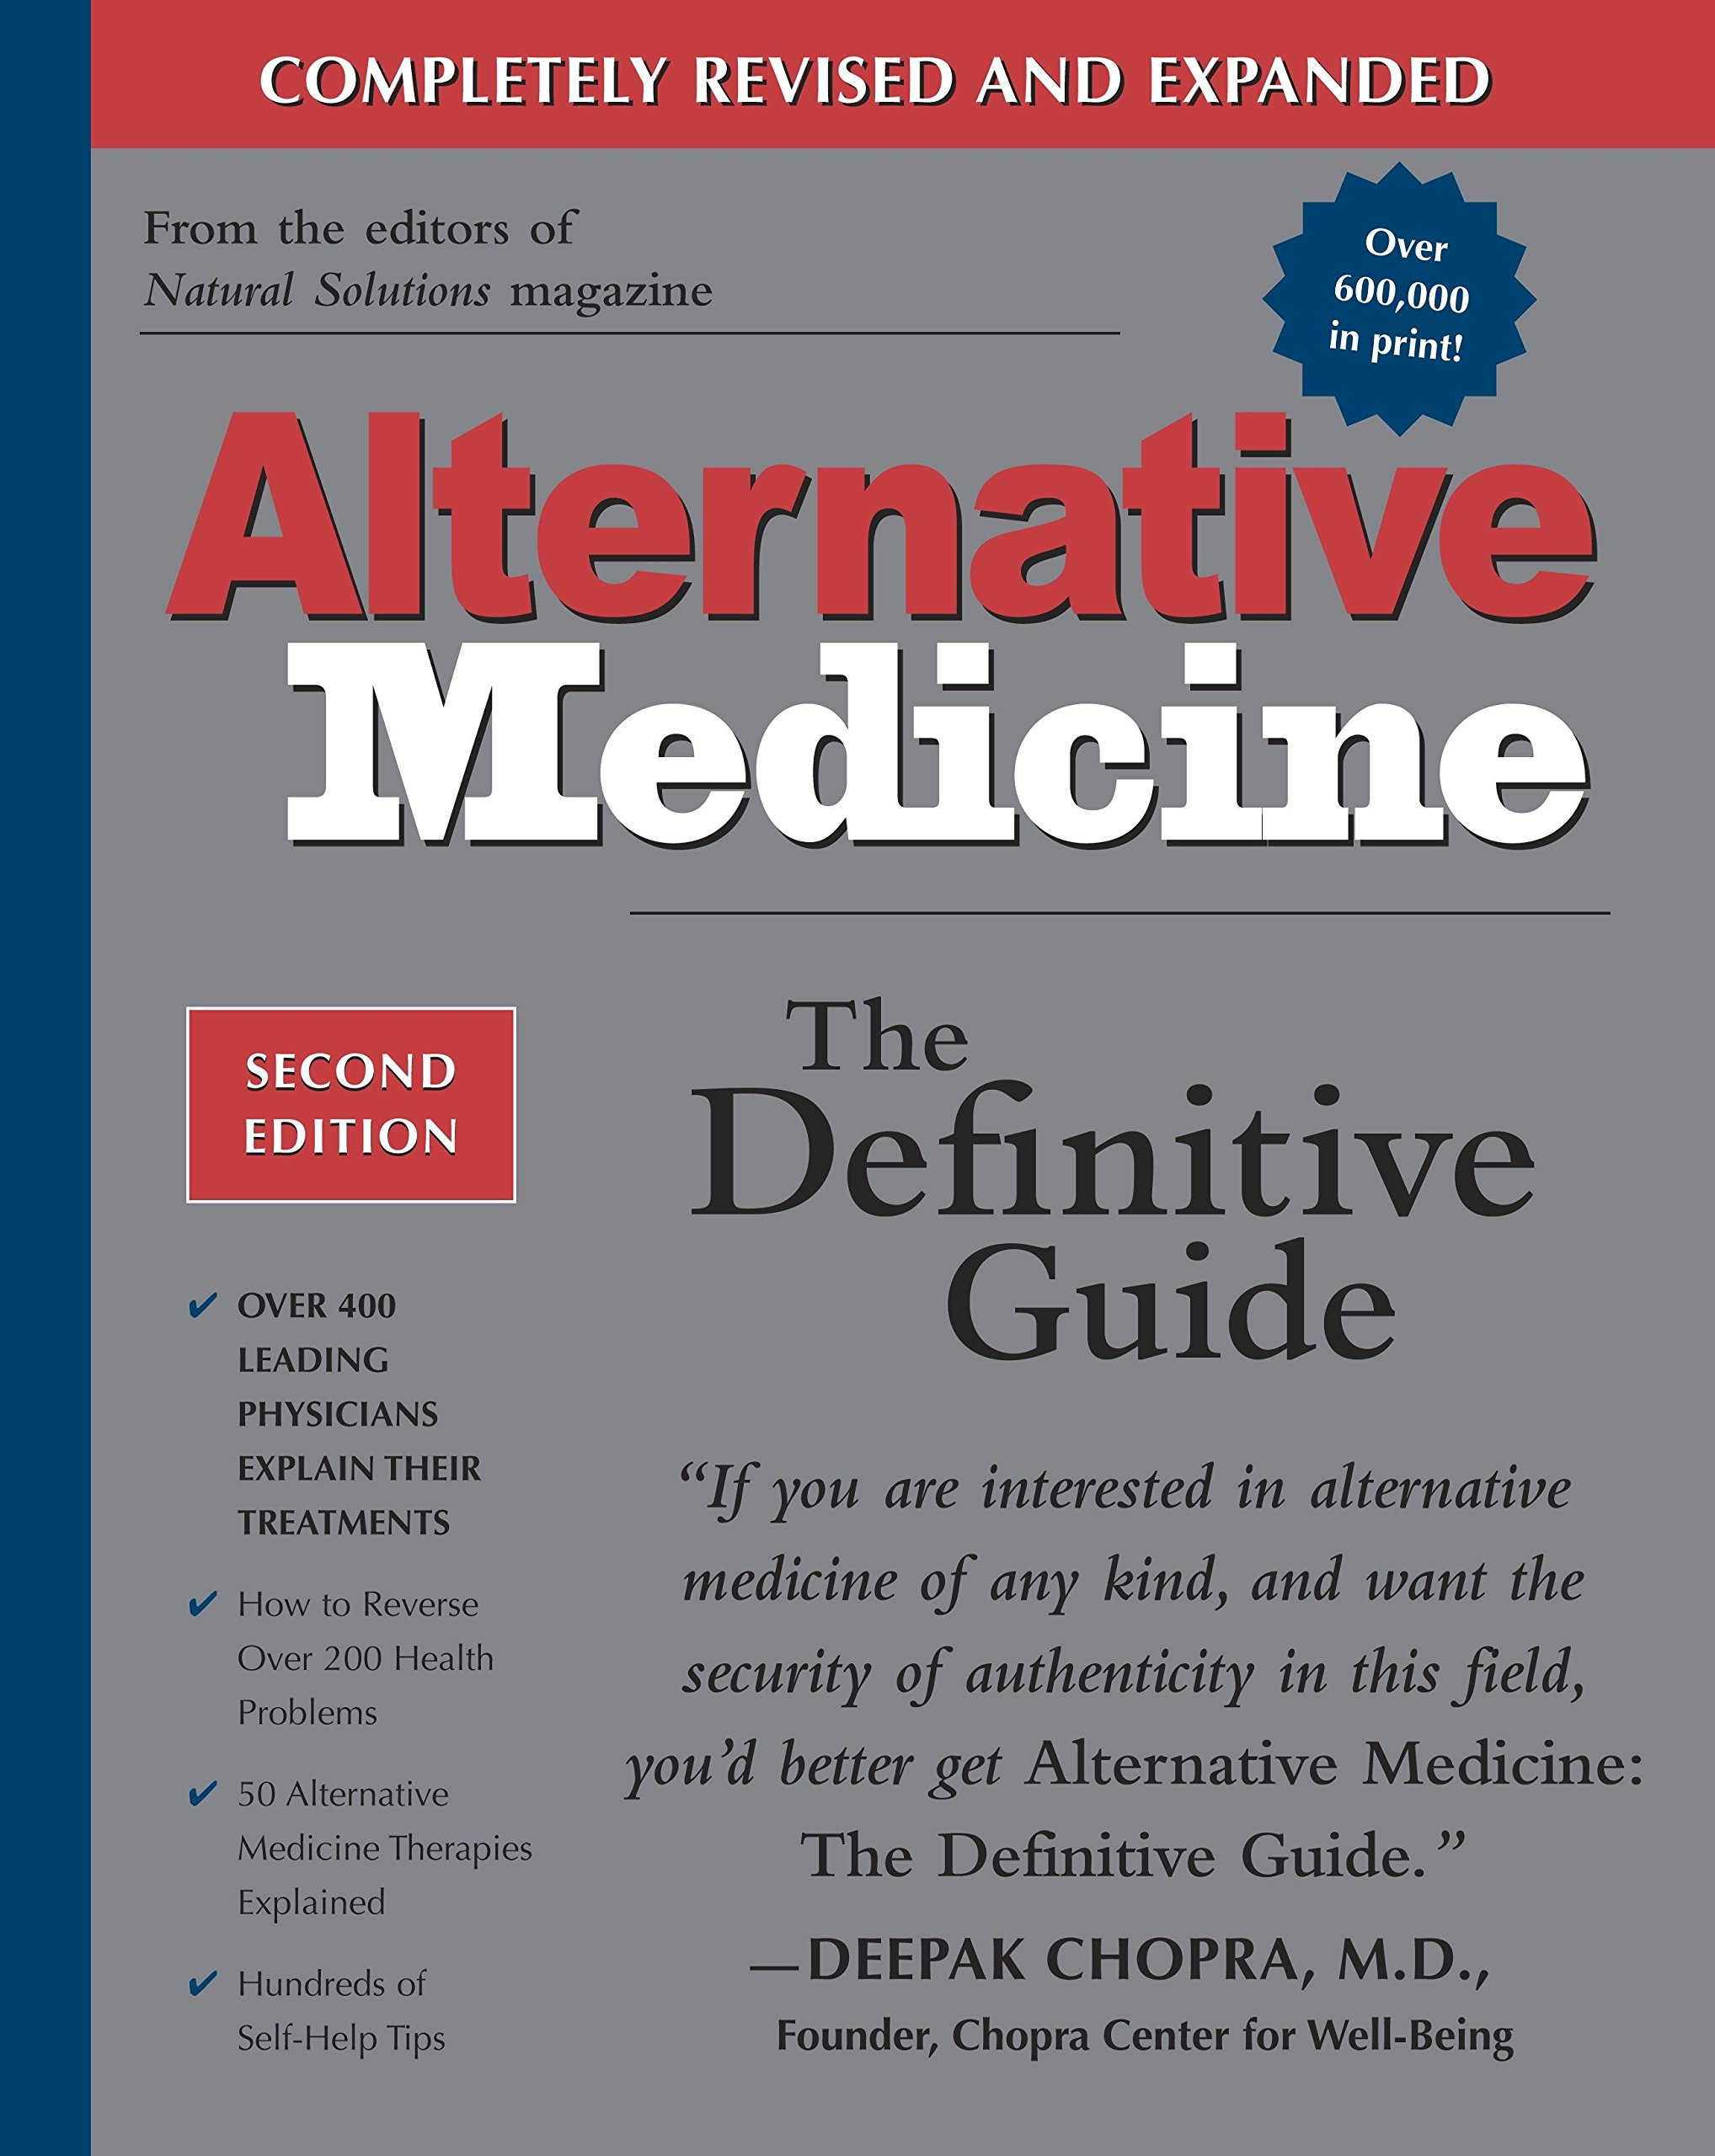 Alternative Medicine: The Definitive Guide (2nd Edition): John W. Anderson,  Larry Trivieri, Burton Goldberg: 9781587611414: Amazon.com: Books